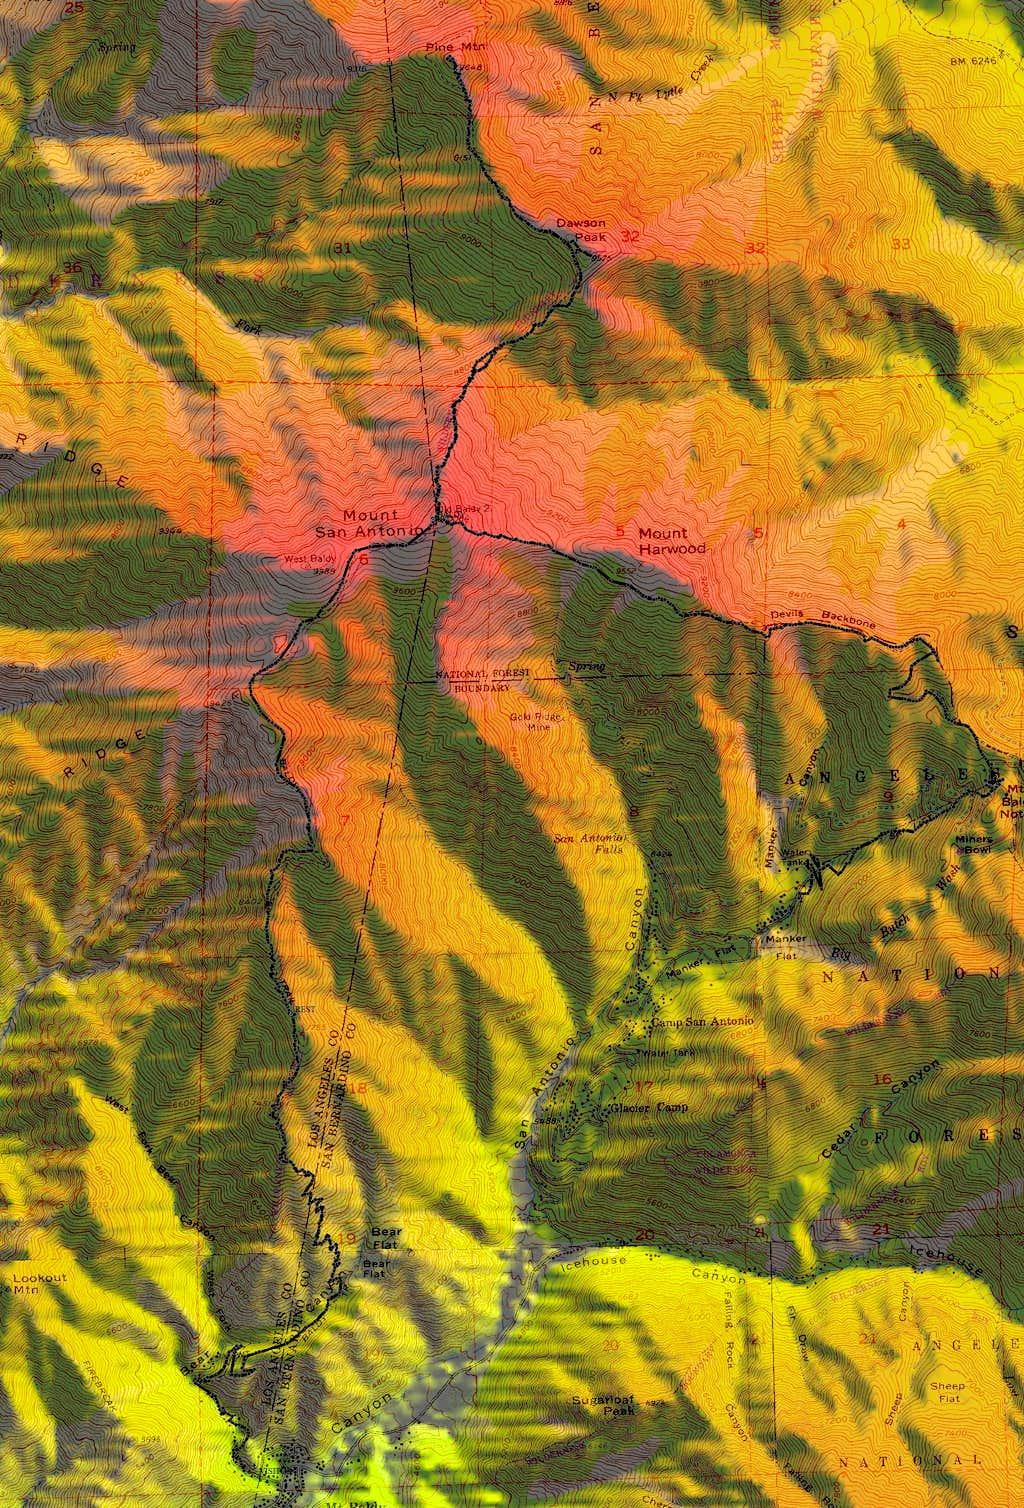 Mount Baldy, Dawson & Pine Hike